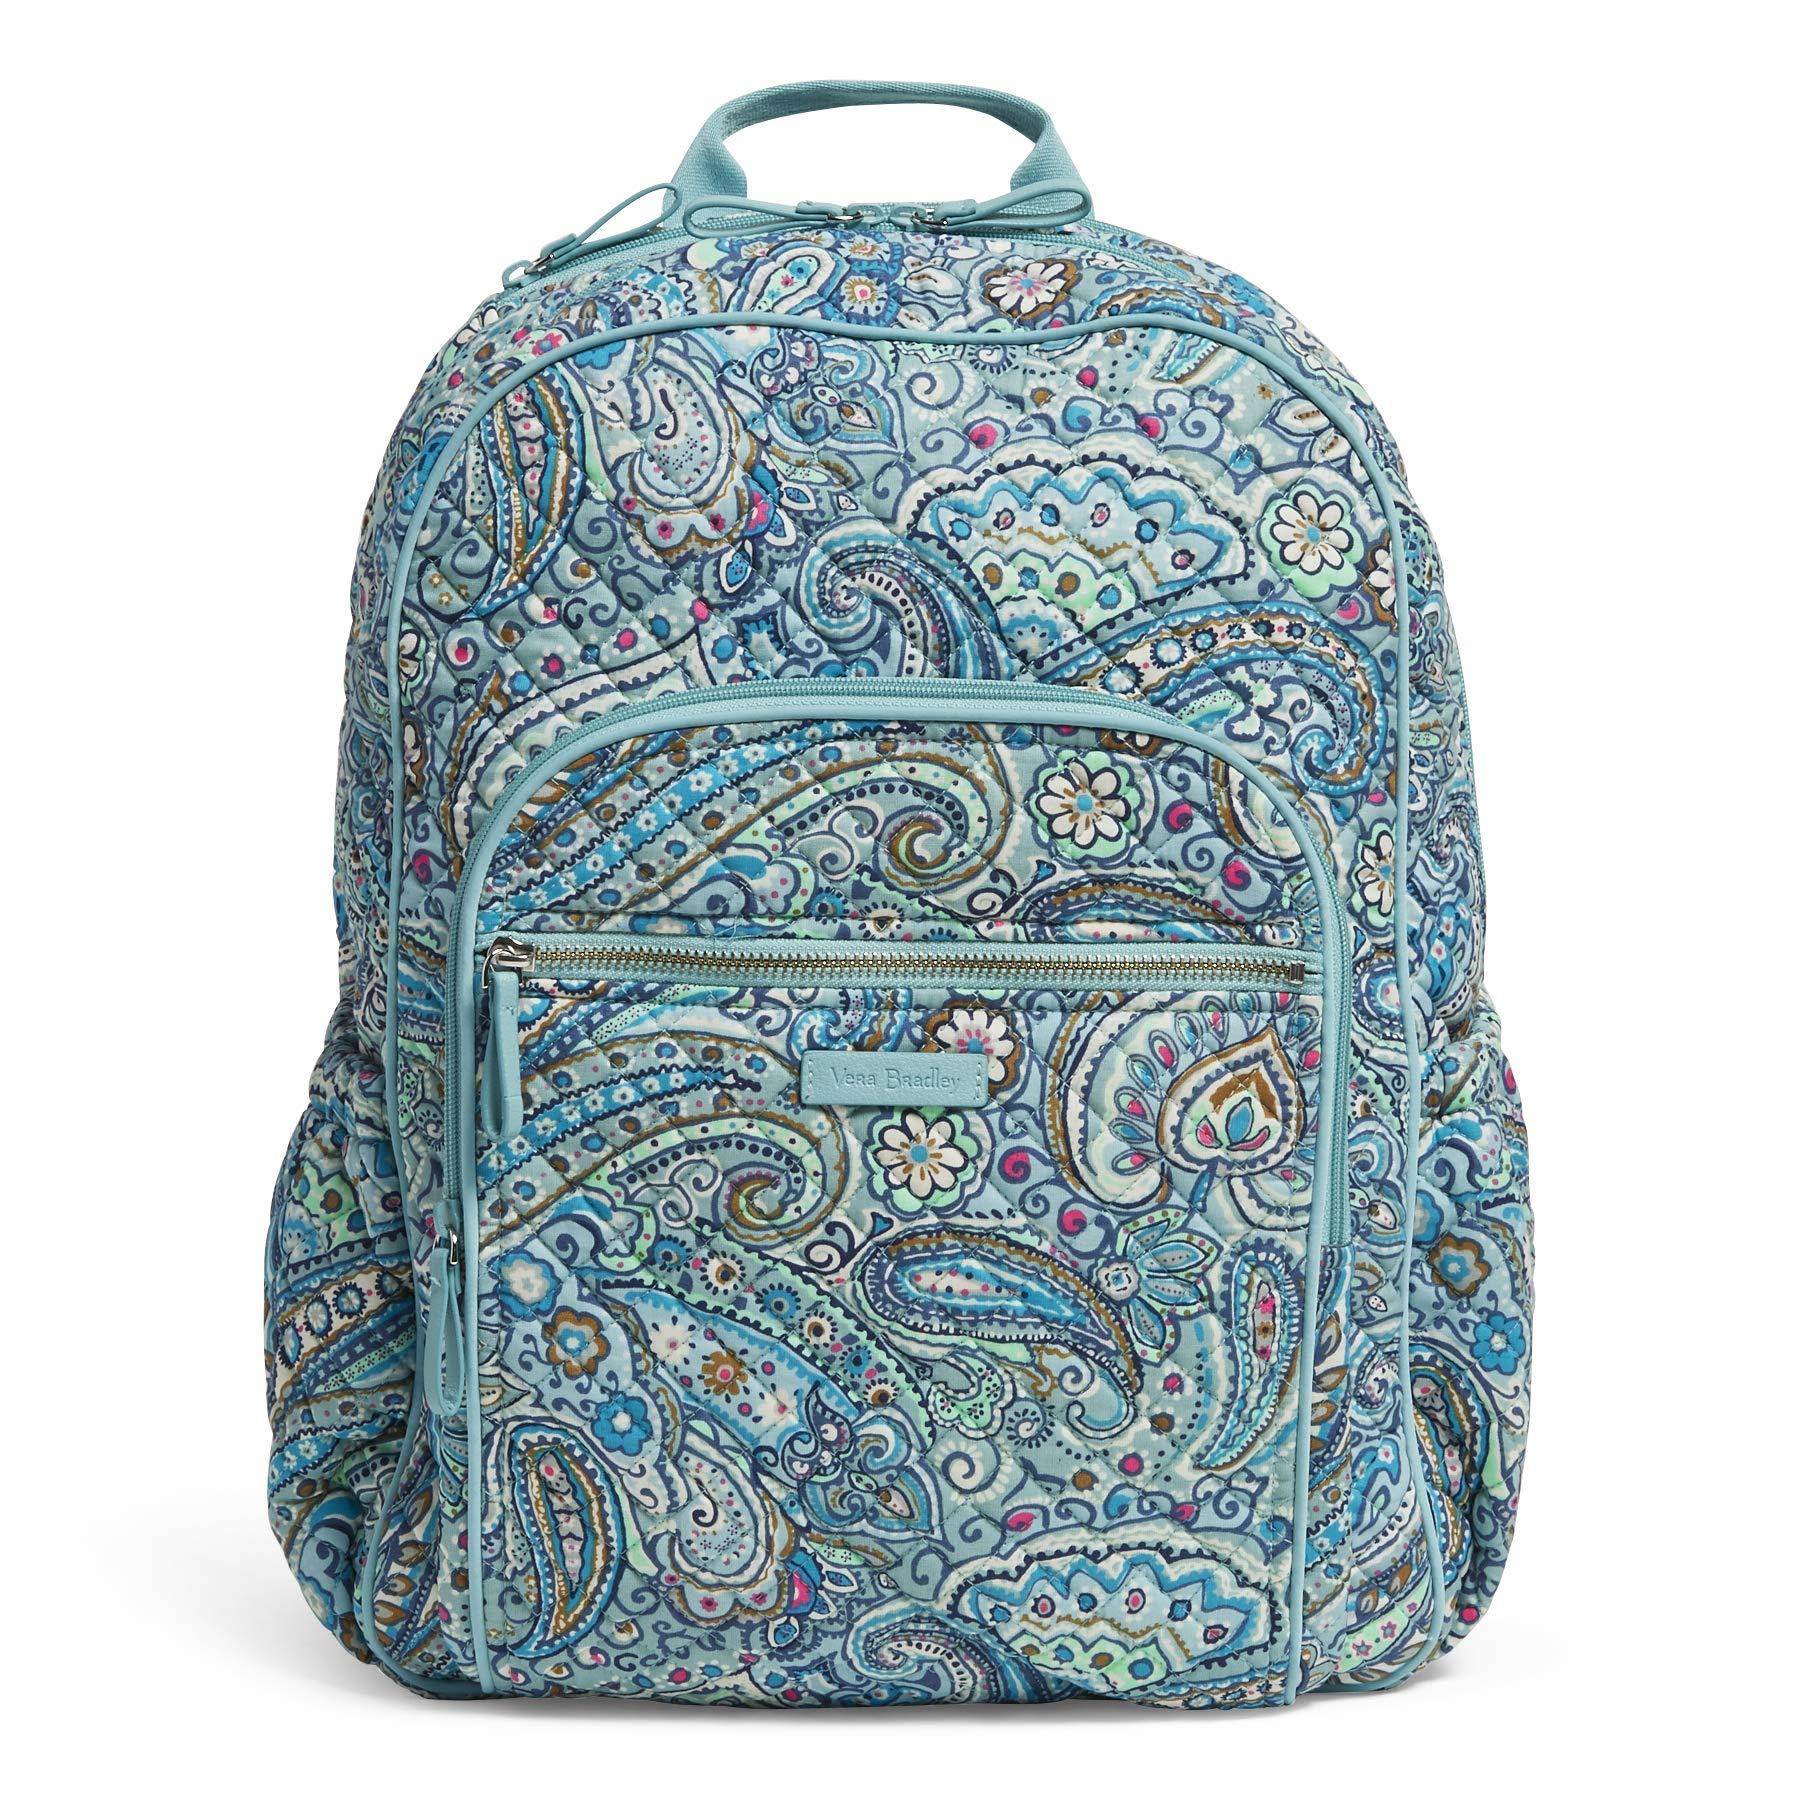 Vera Bradley Iconic Campus Backpack, Signature Cotton, Daisy Dot Paisley